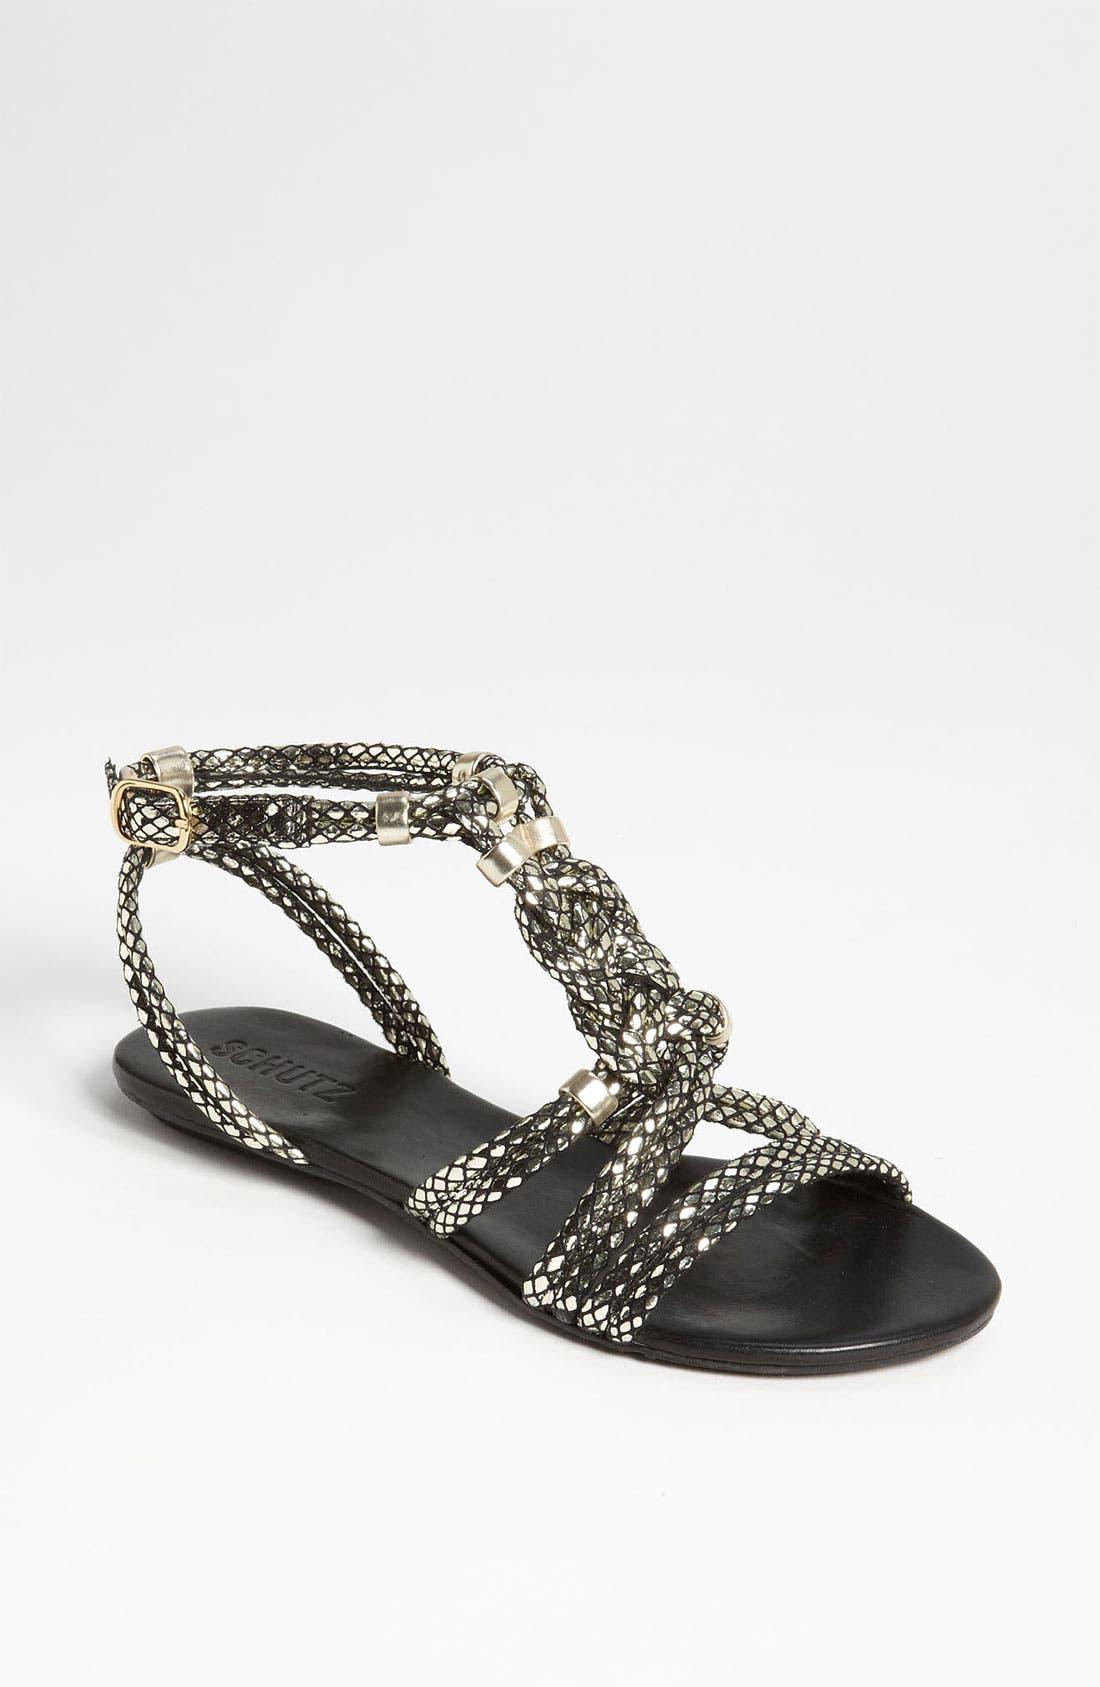 Main Image - Schutz 'Akshanan' Sandal